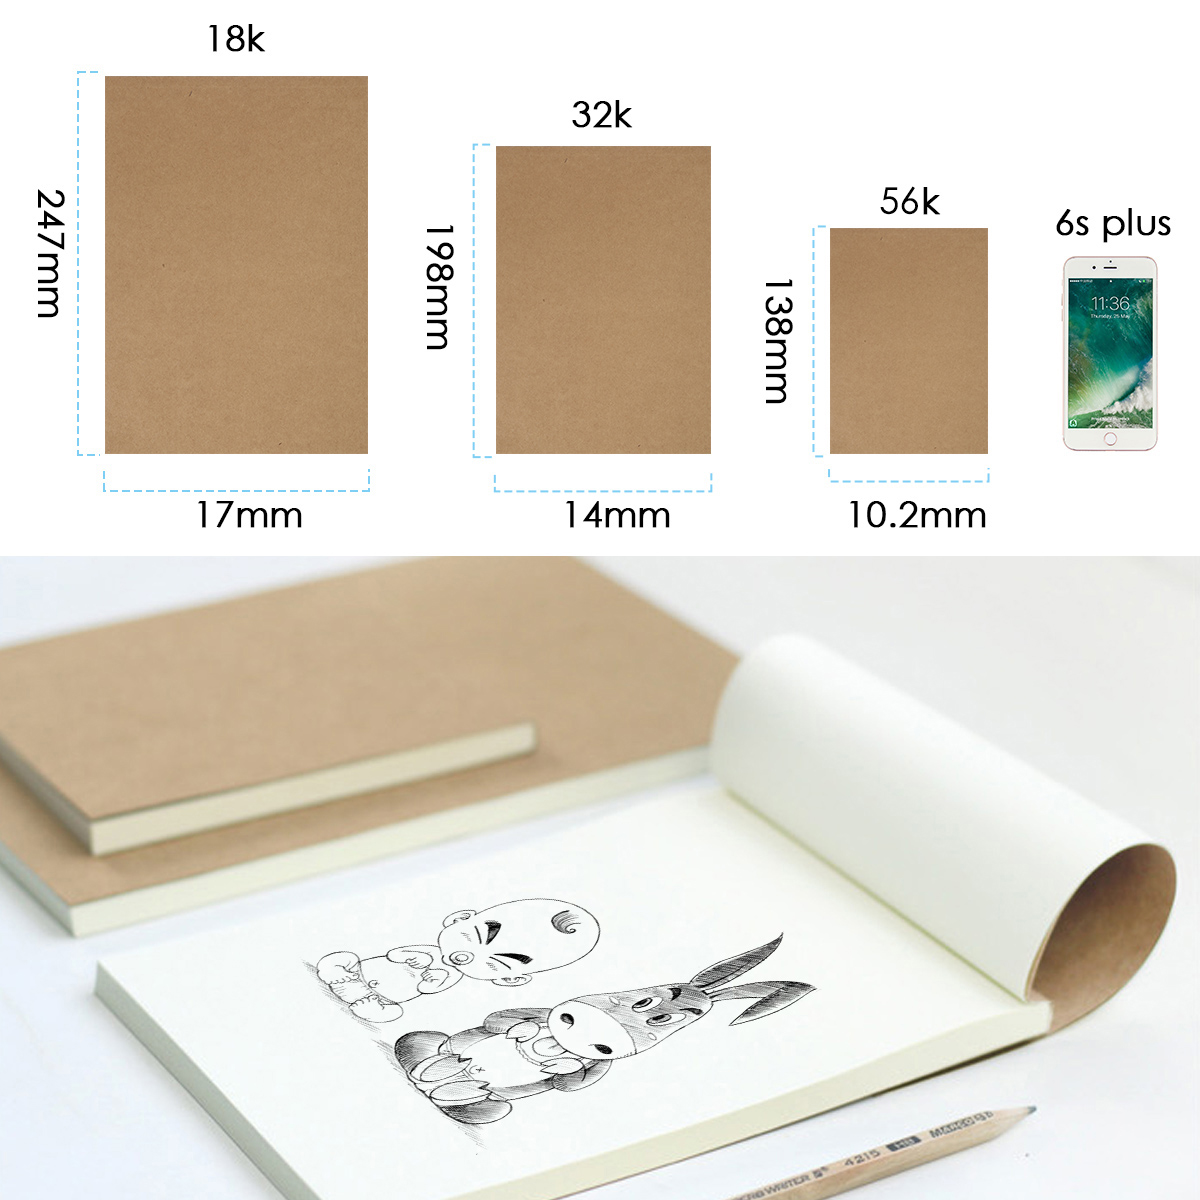 80 Sheets 18K/32K/56K Blank Flipbook Kraft Cover Drawing Sketchbook Thumb Flip Books For Animation Cartoon Creation